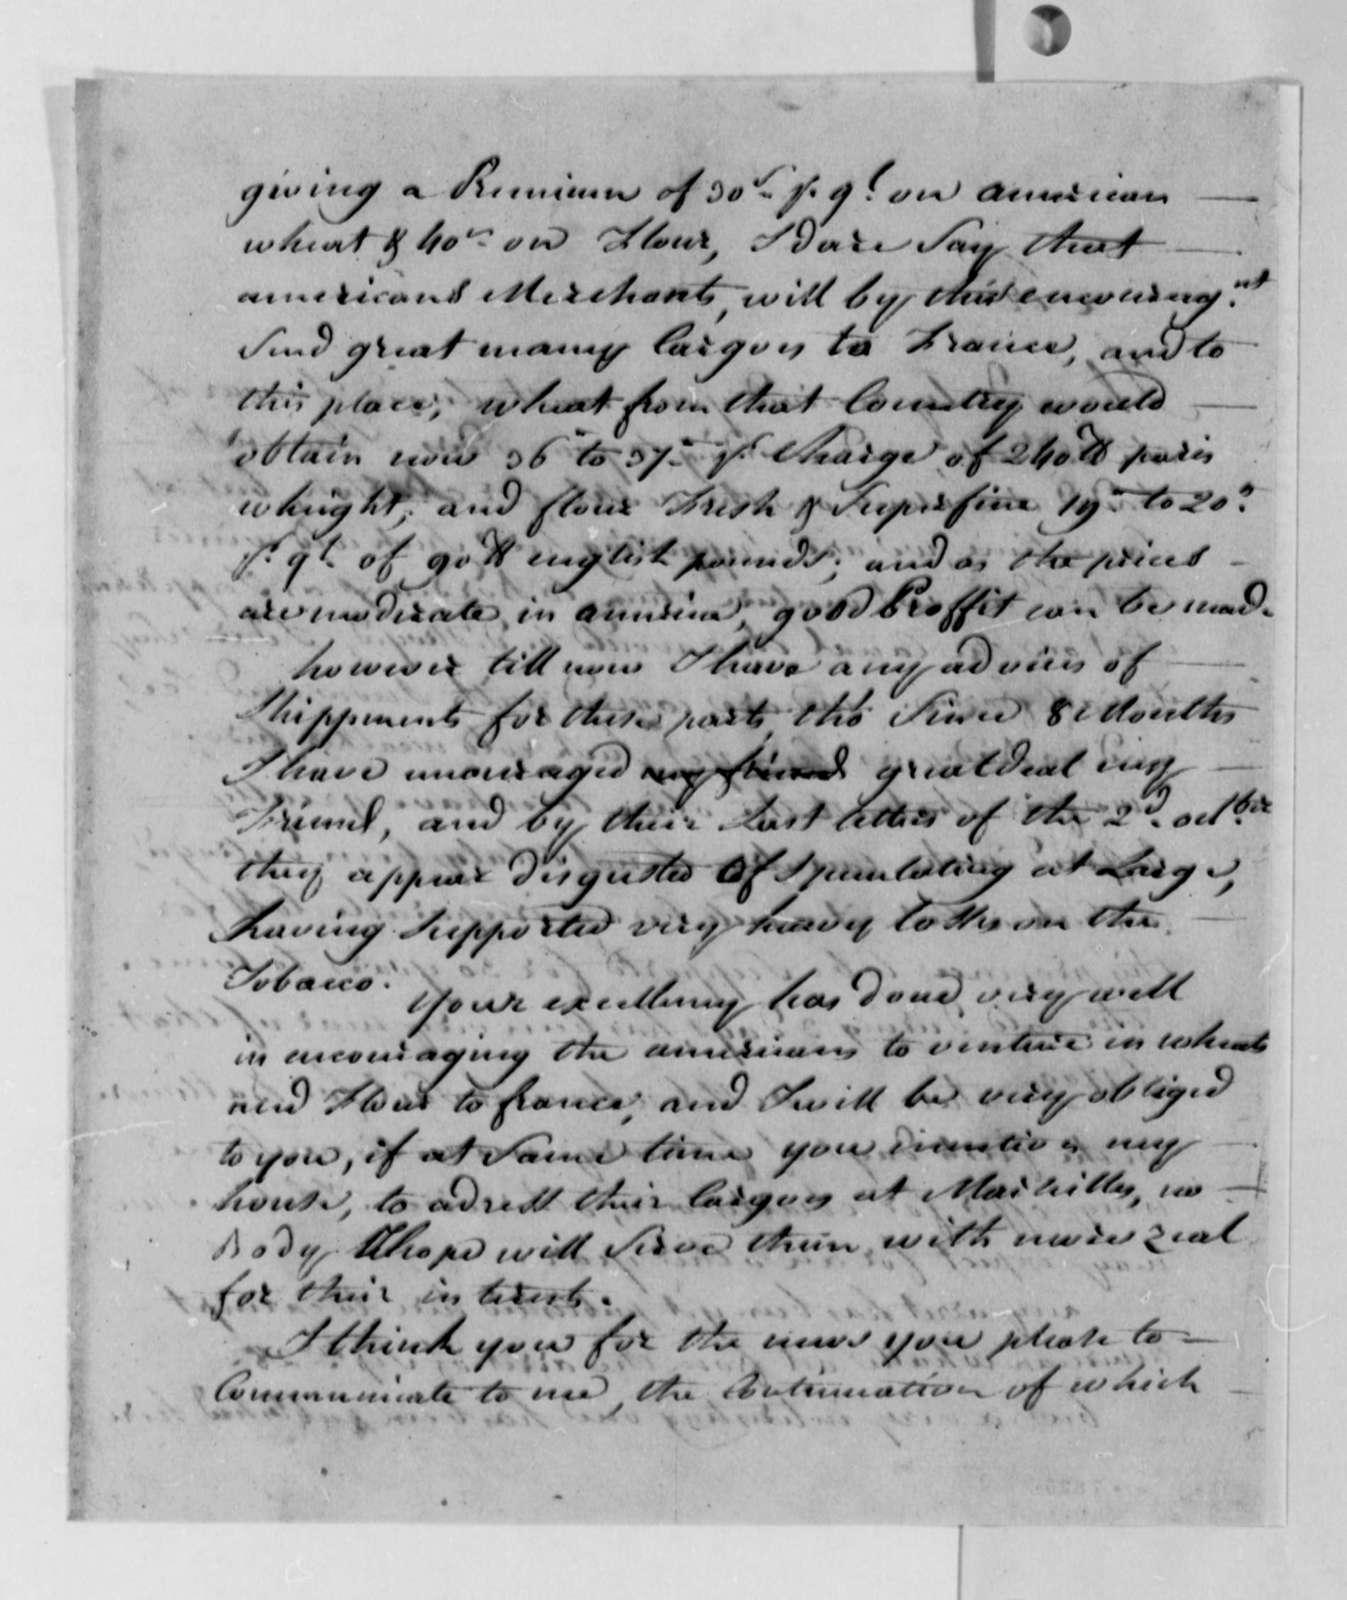 Stephen Cathalan Jr. to Thomas Jefferson, January 1, 1789